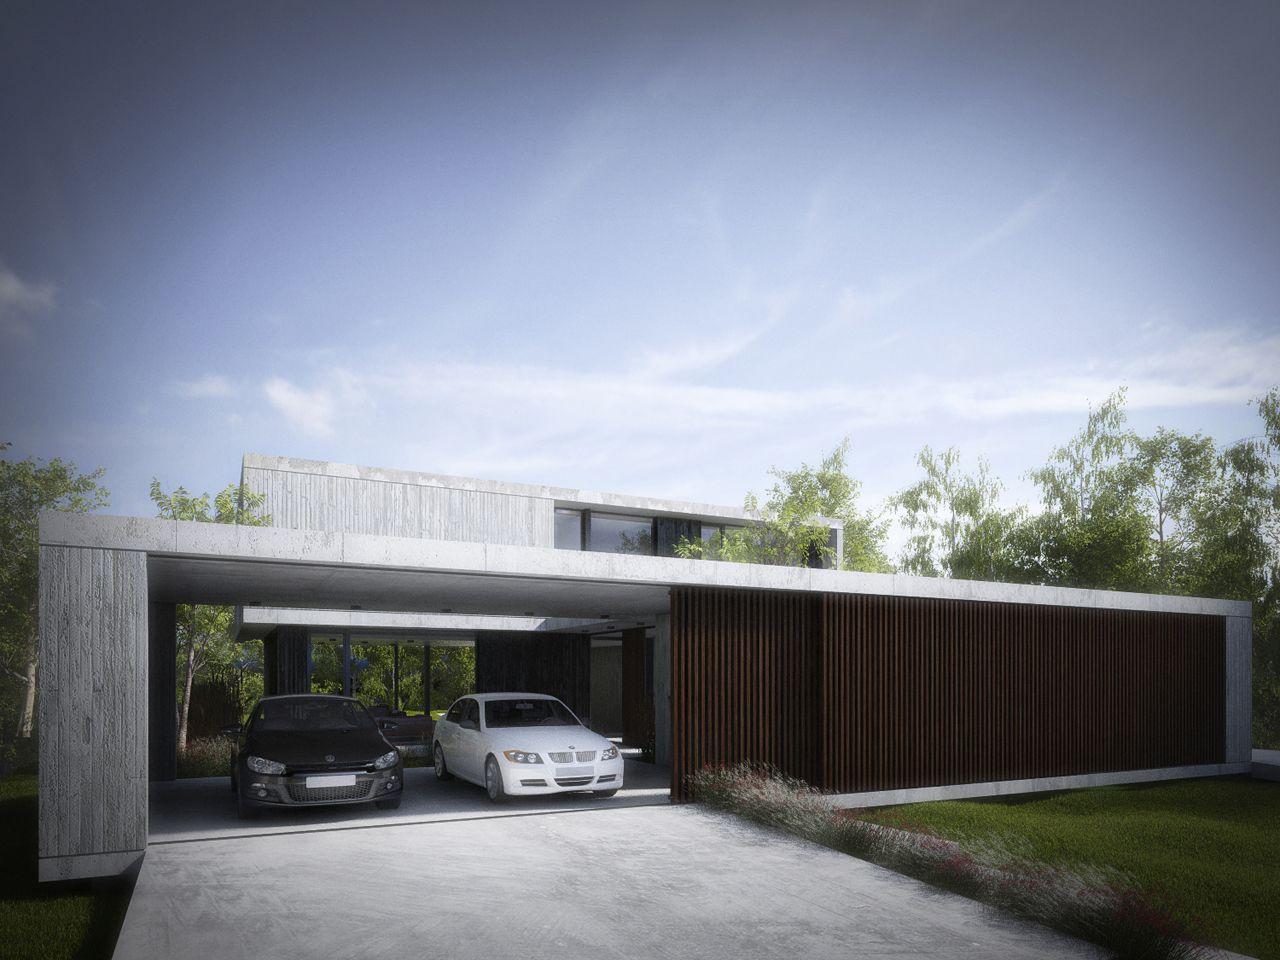 Proyectos ezequiel amado cattaneo casa escobar 1 for Moderne architektur villa